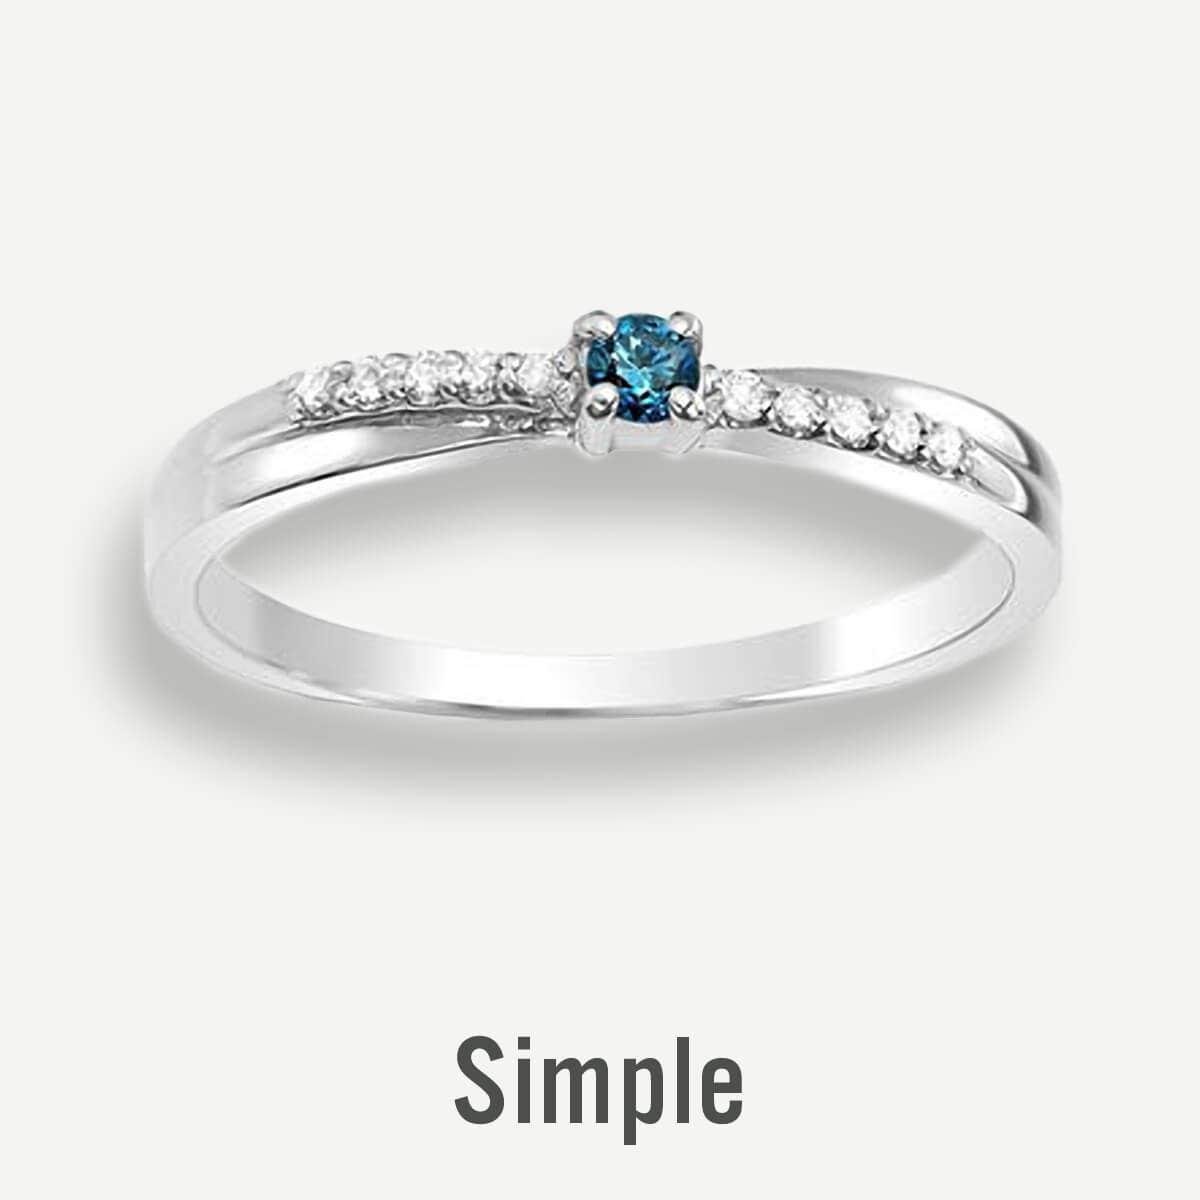 Simple Promise Rings